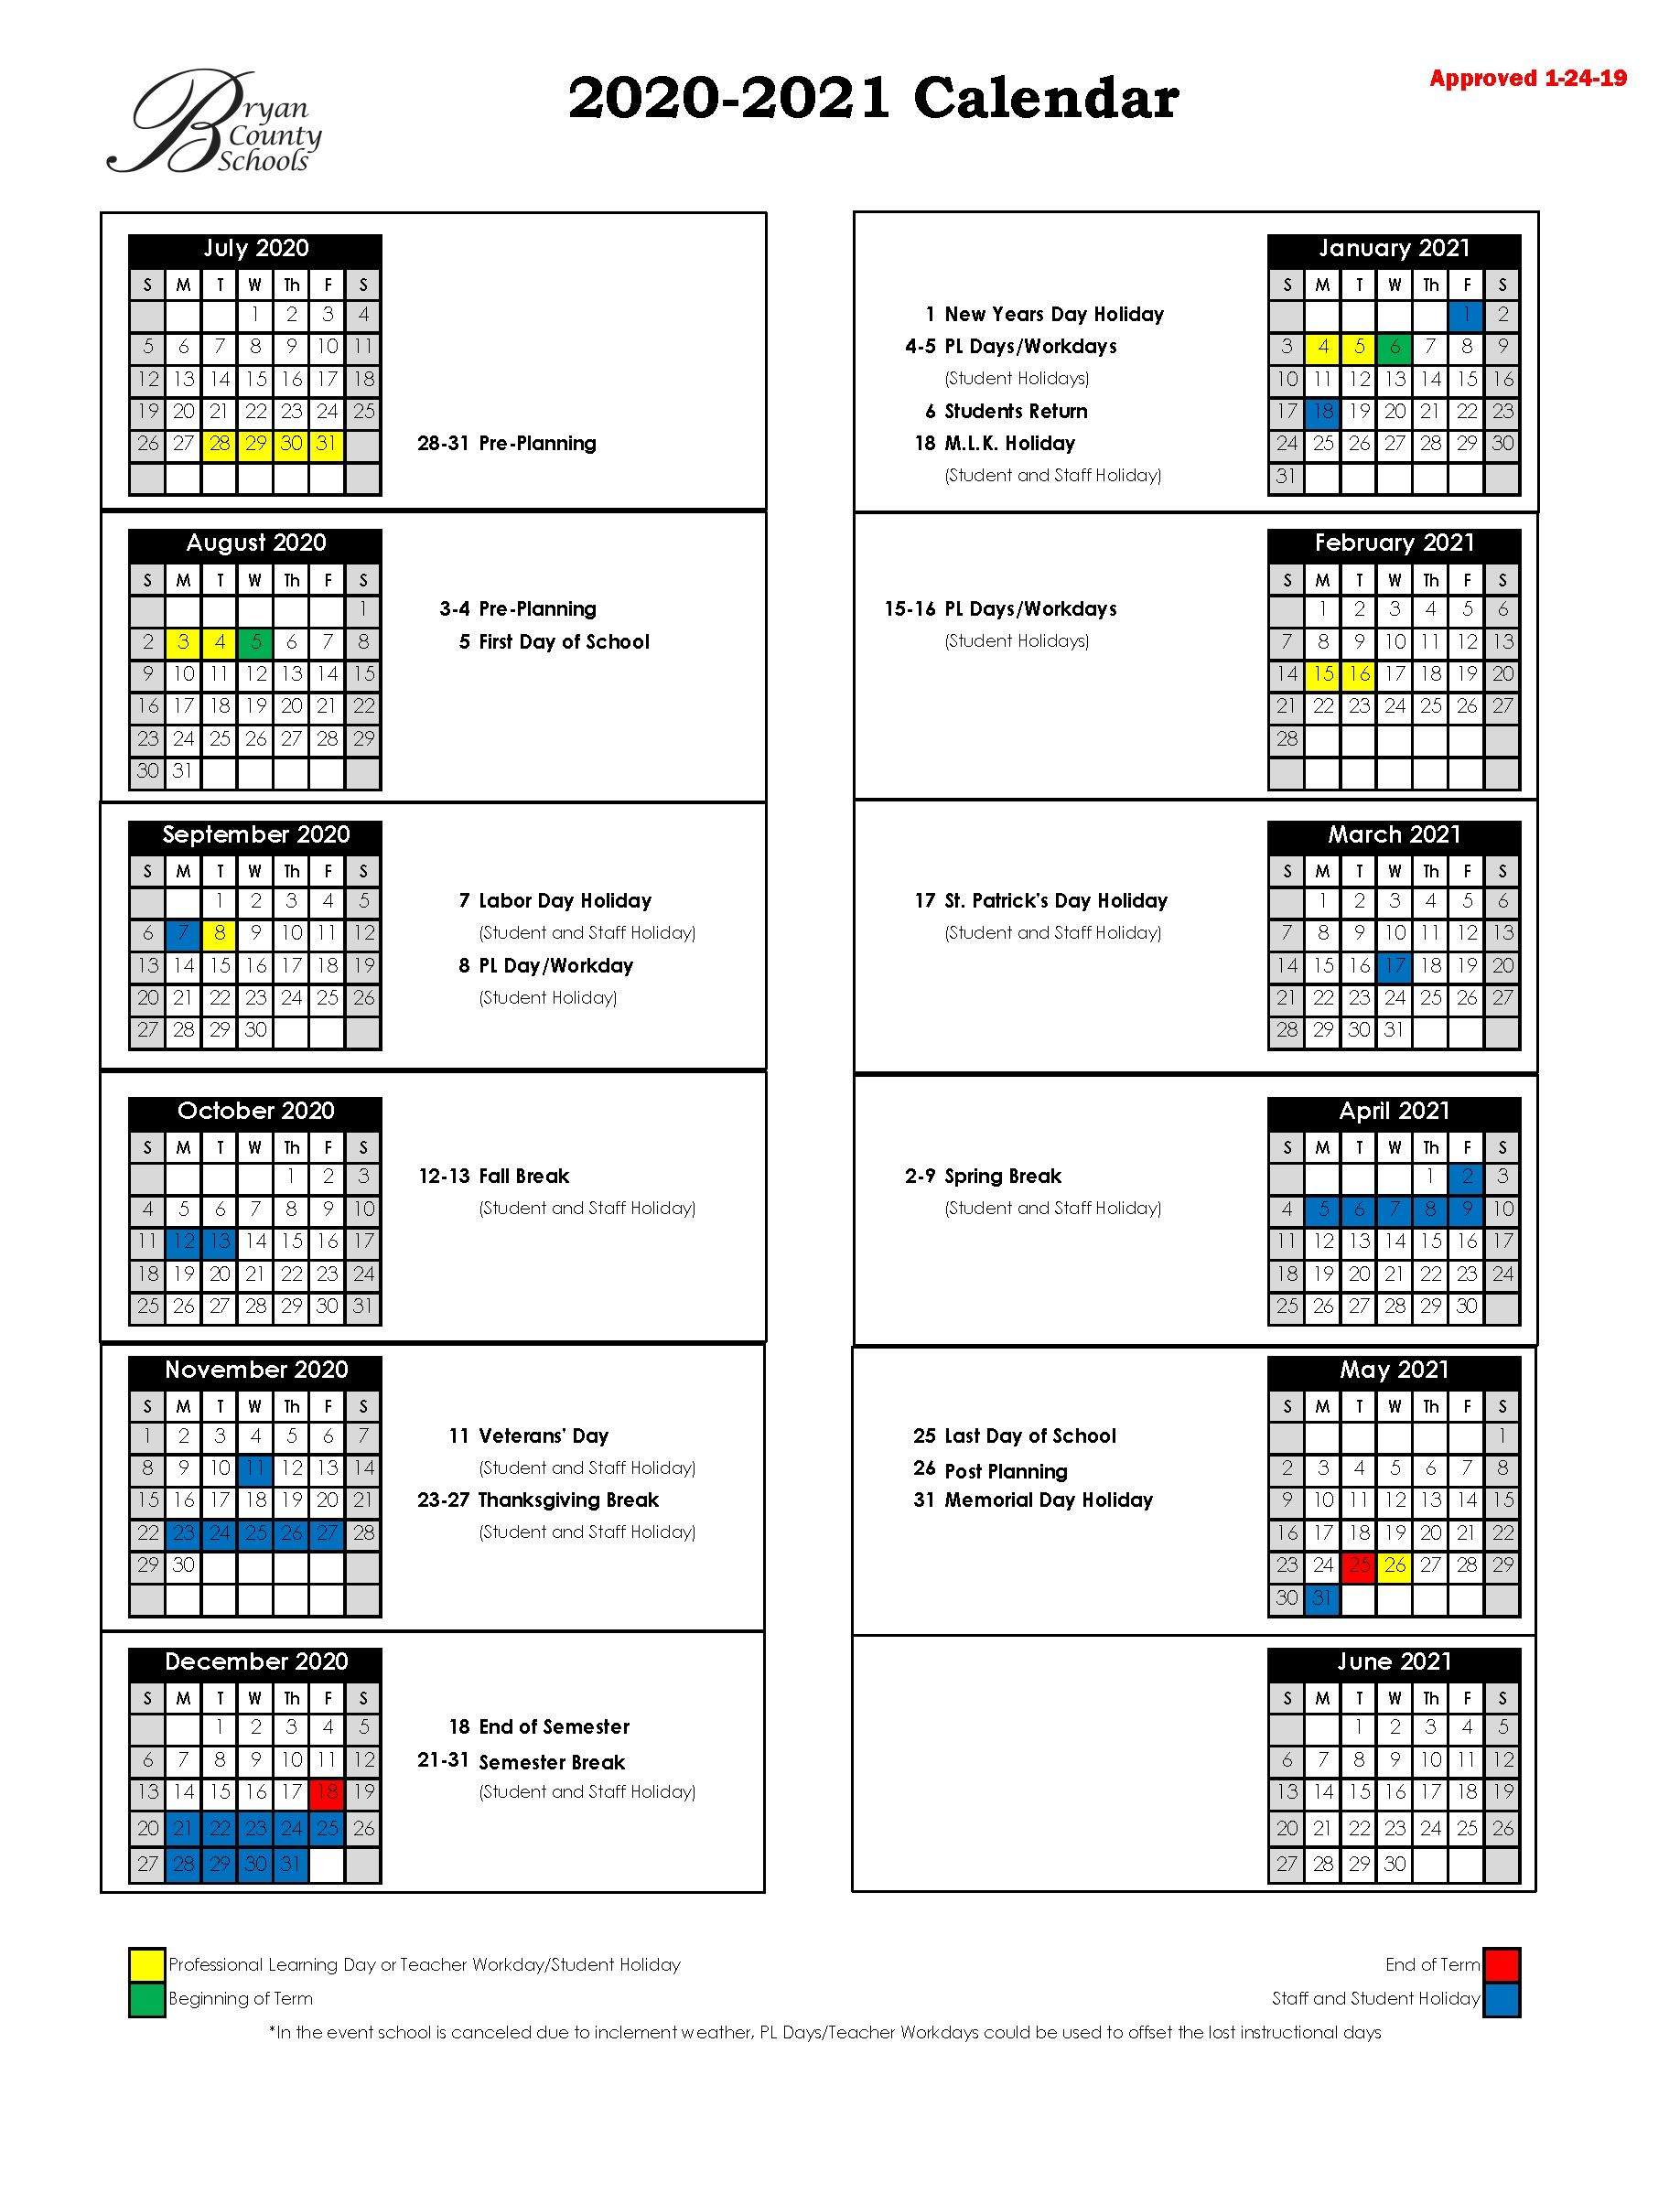 Richland 2 Calendar 2021 Richland 2 Printable Calendar | Printable calendar, Printable